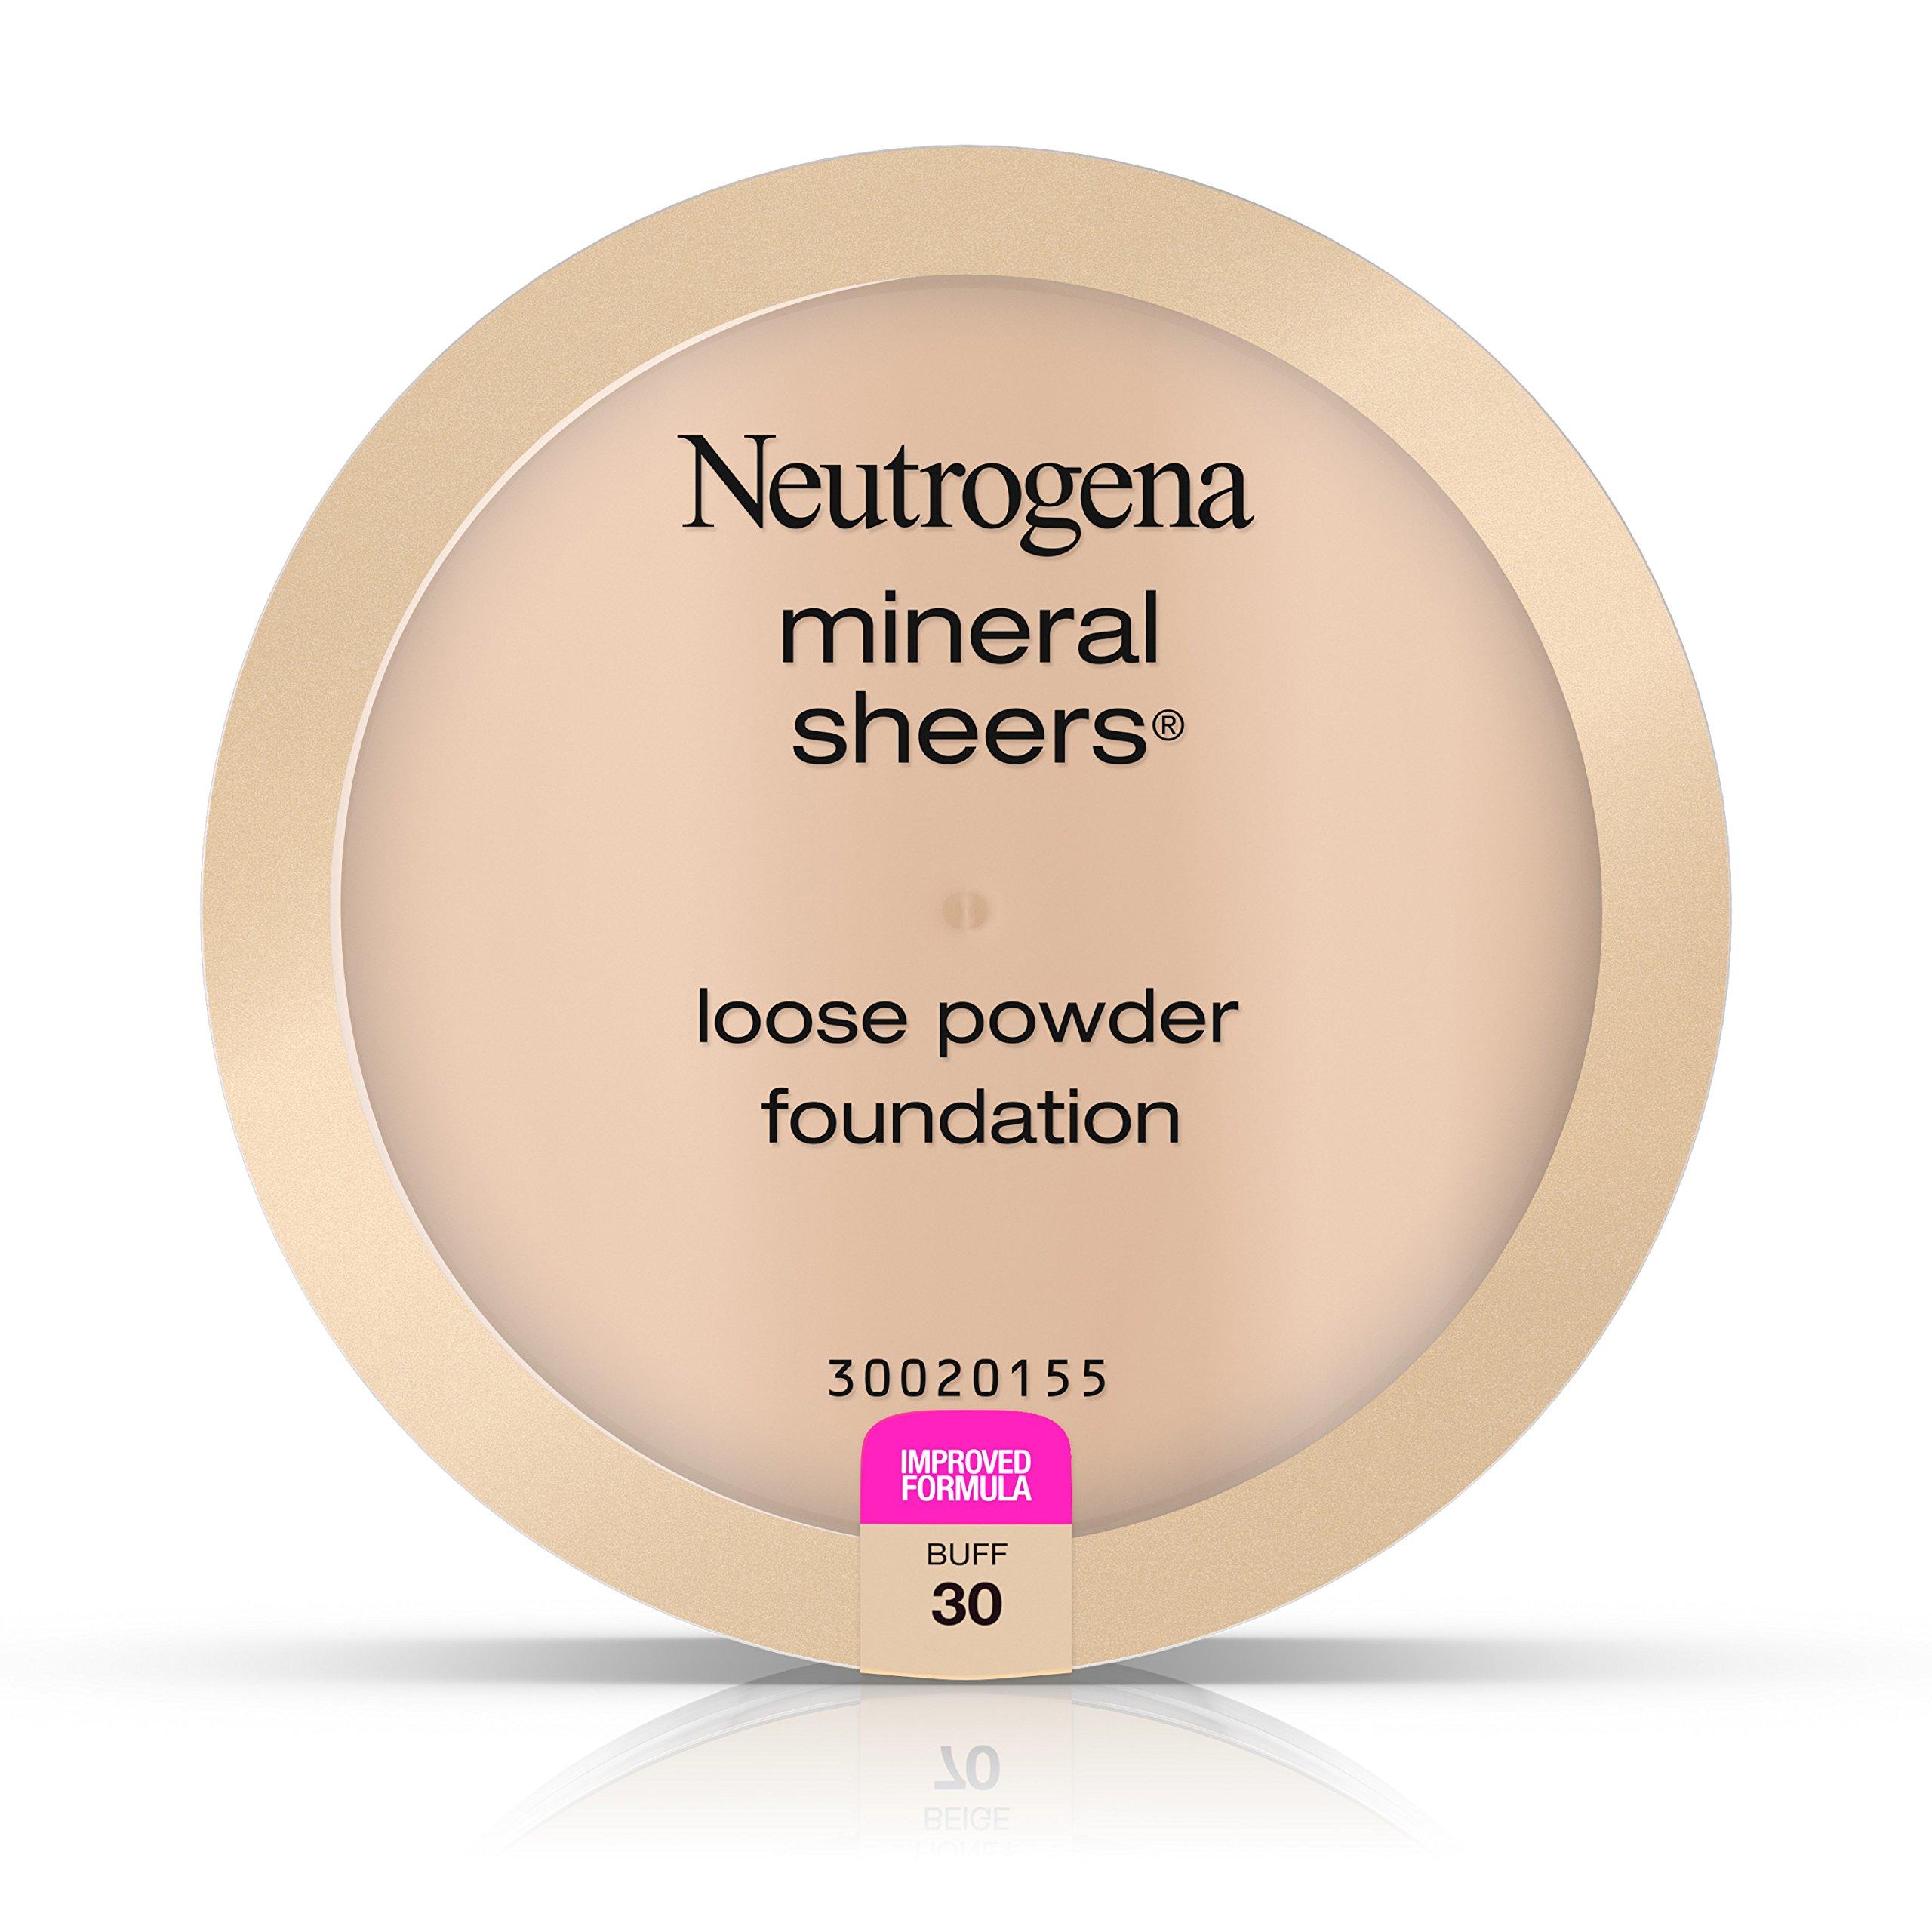 Neutrogena Mineral Sheers Loose Powder Foundation, Buff 30.19 Oz.